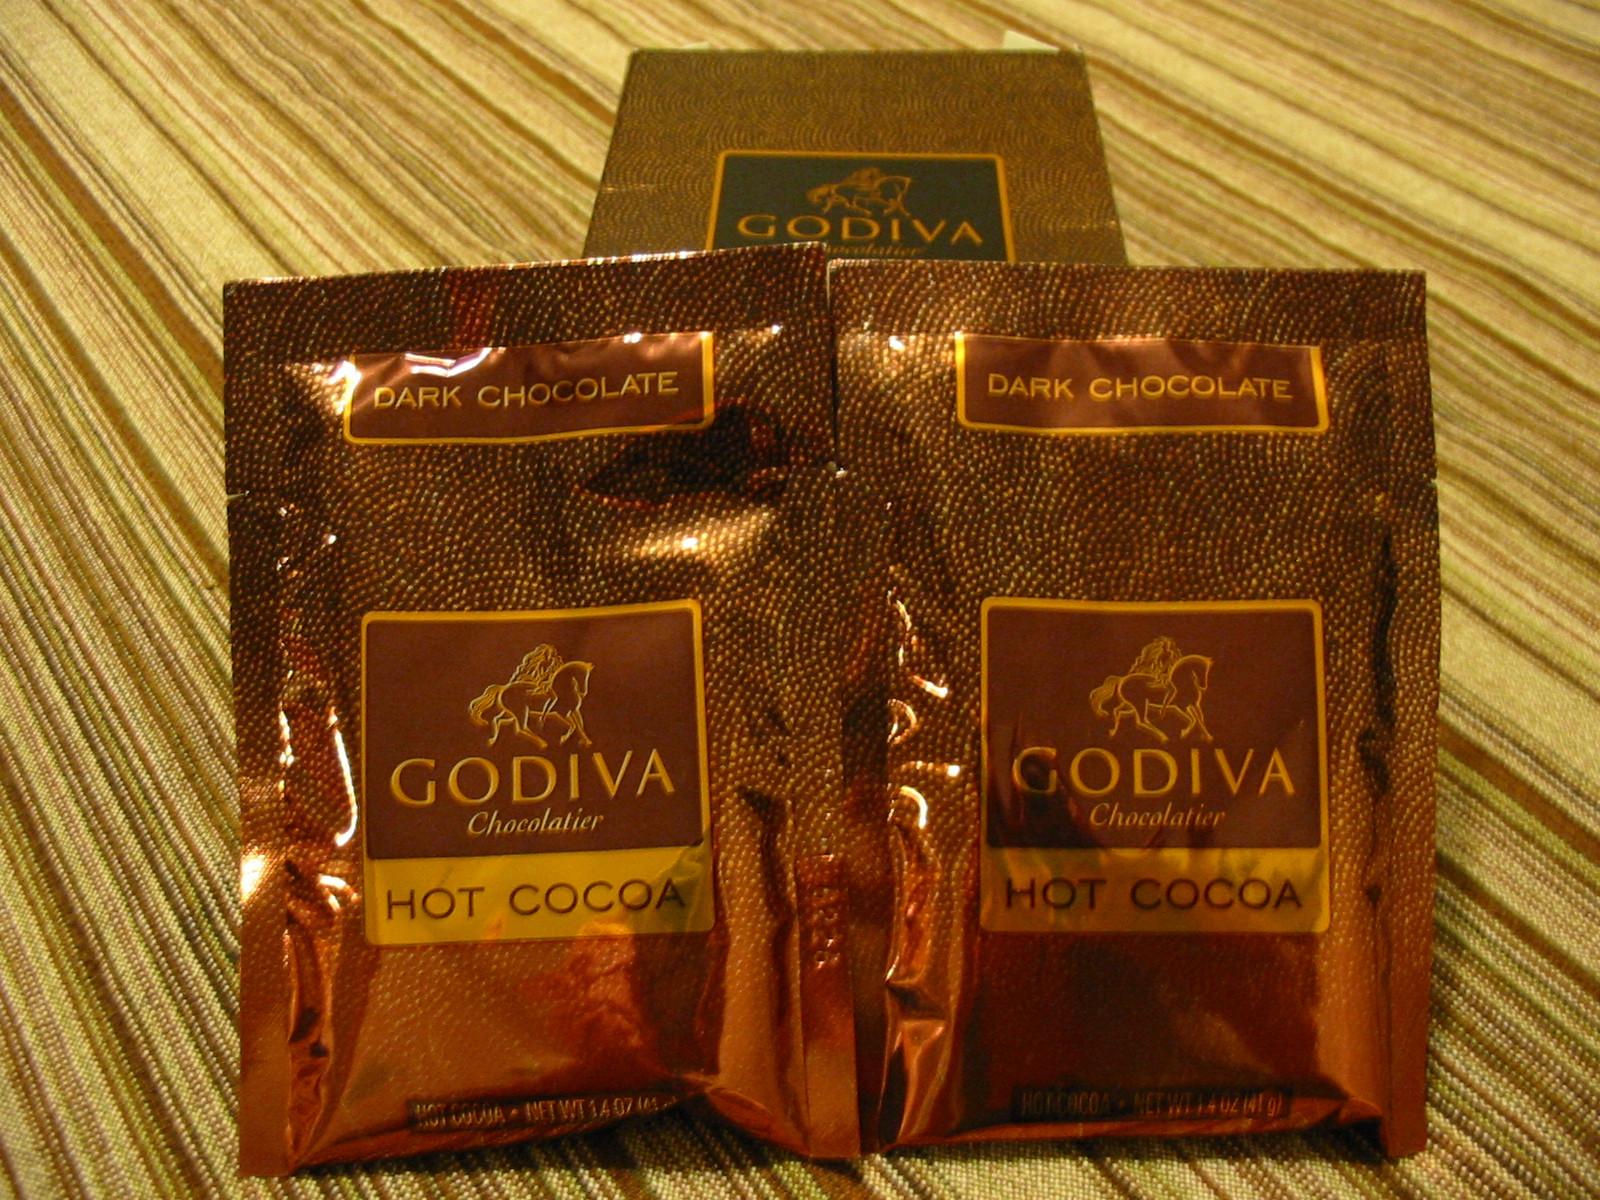 Godiva Hot Chocolate  The Chocolate Cult Godiva Hot Cocoa Reviewed